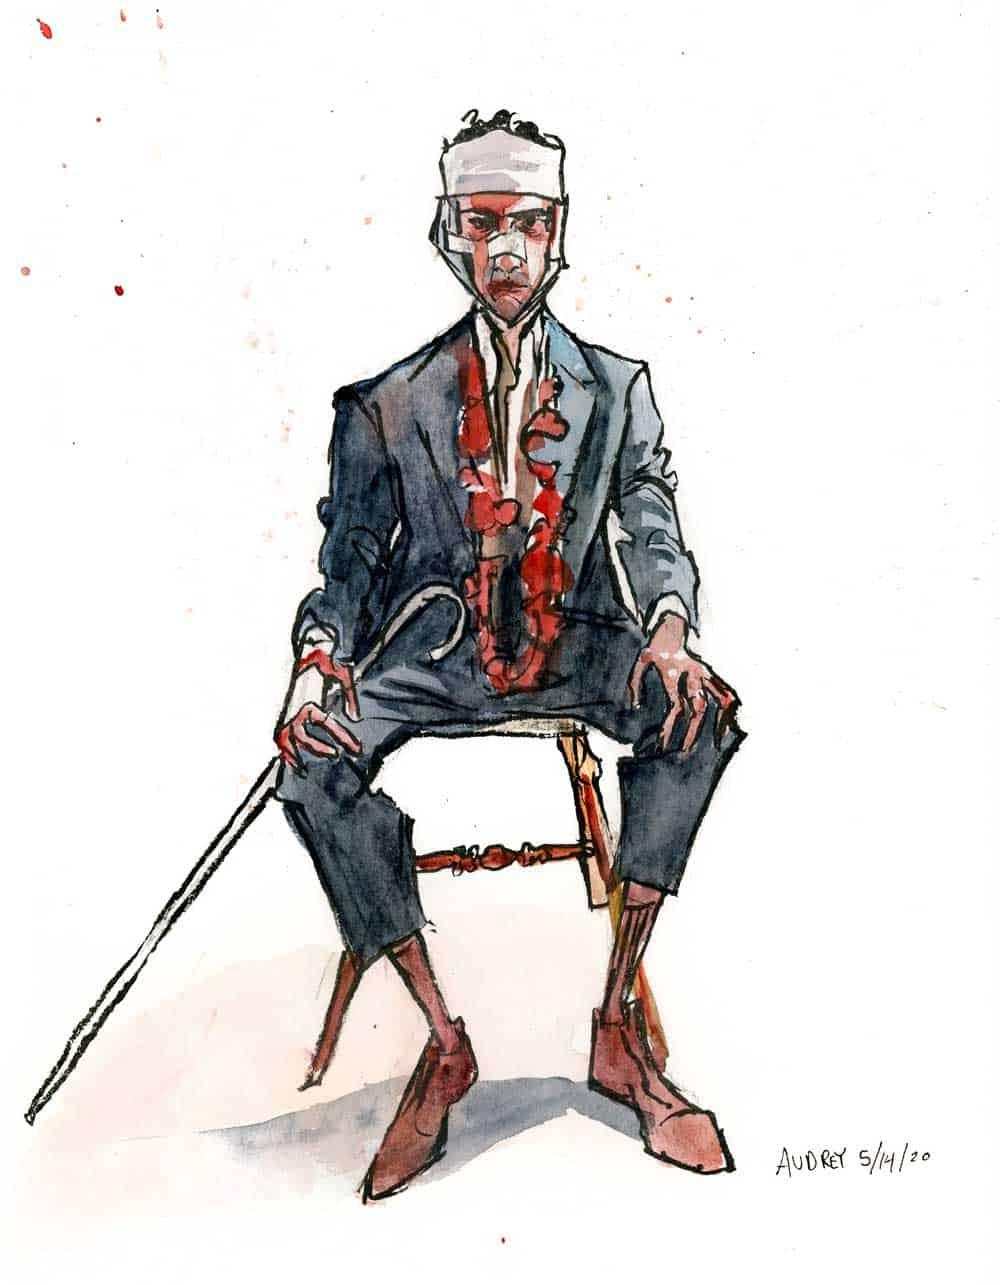 Watercolor of man sitting